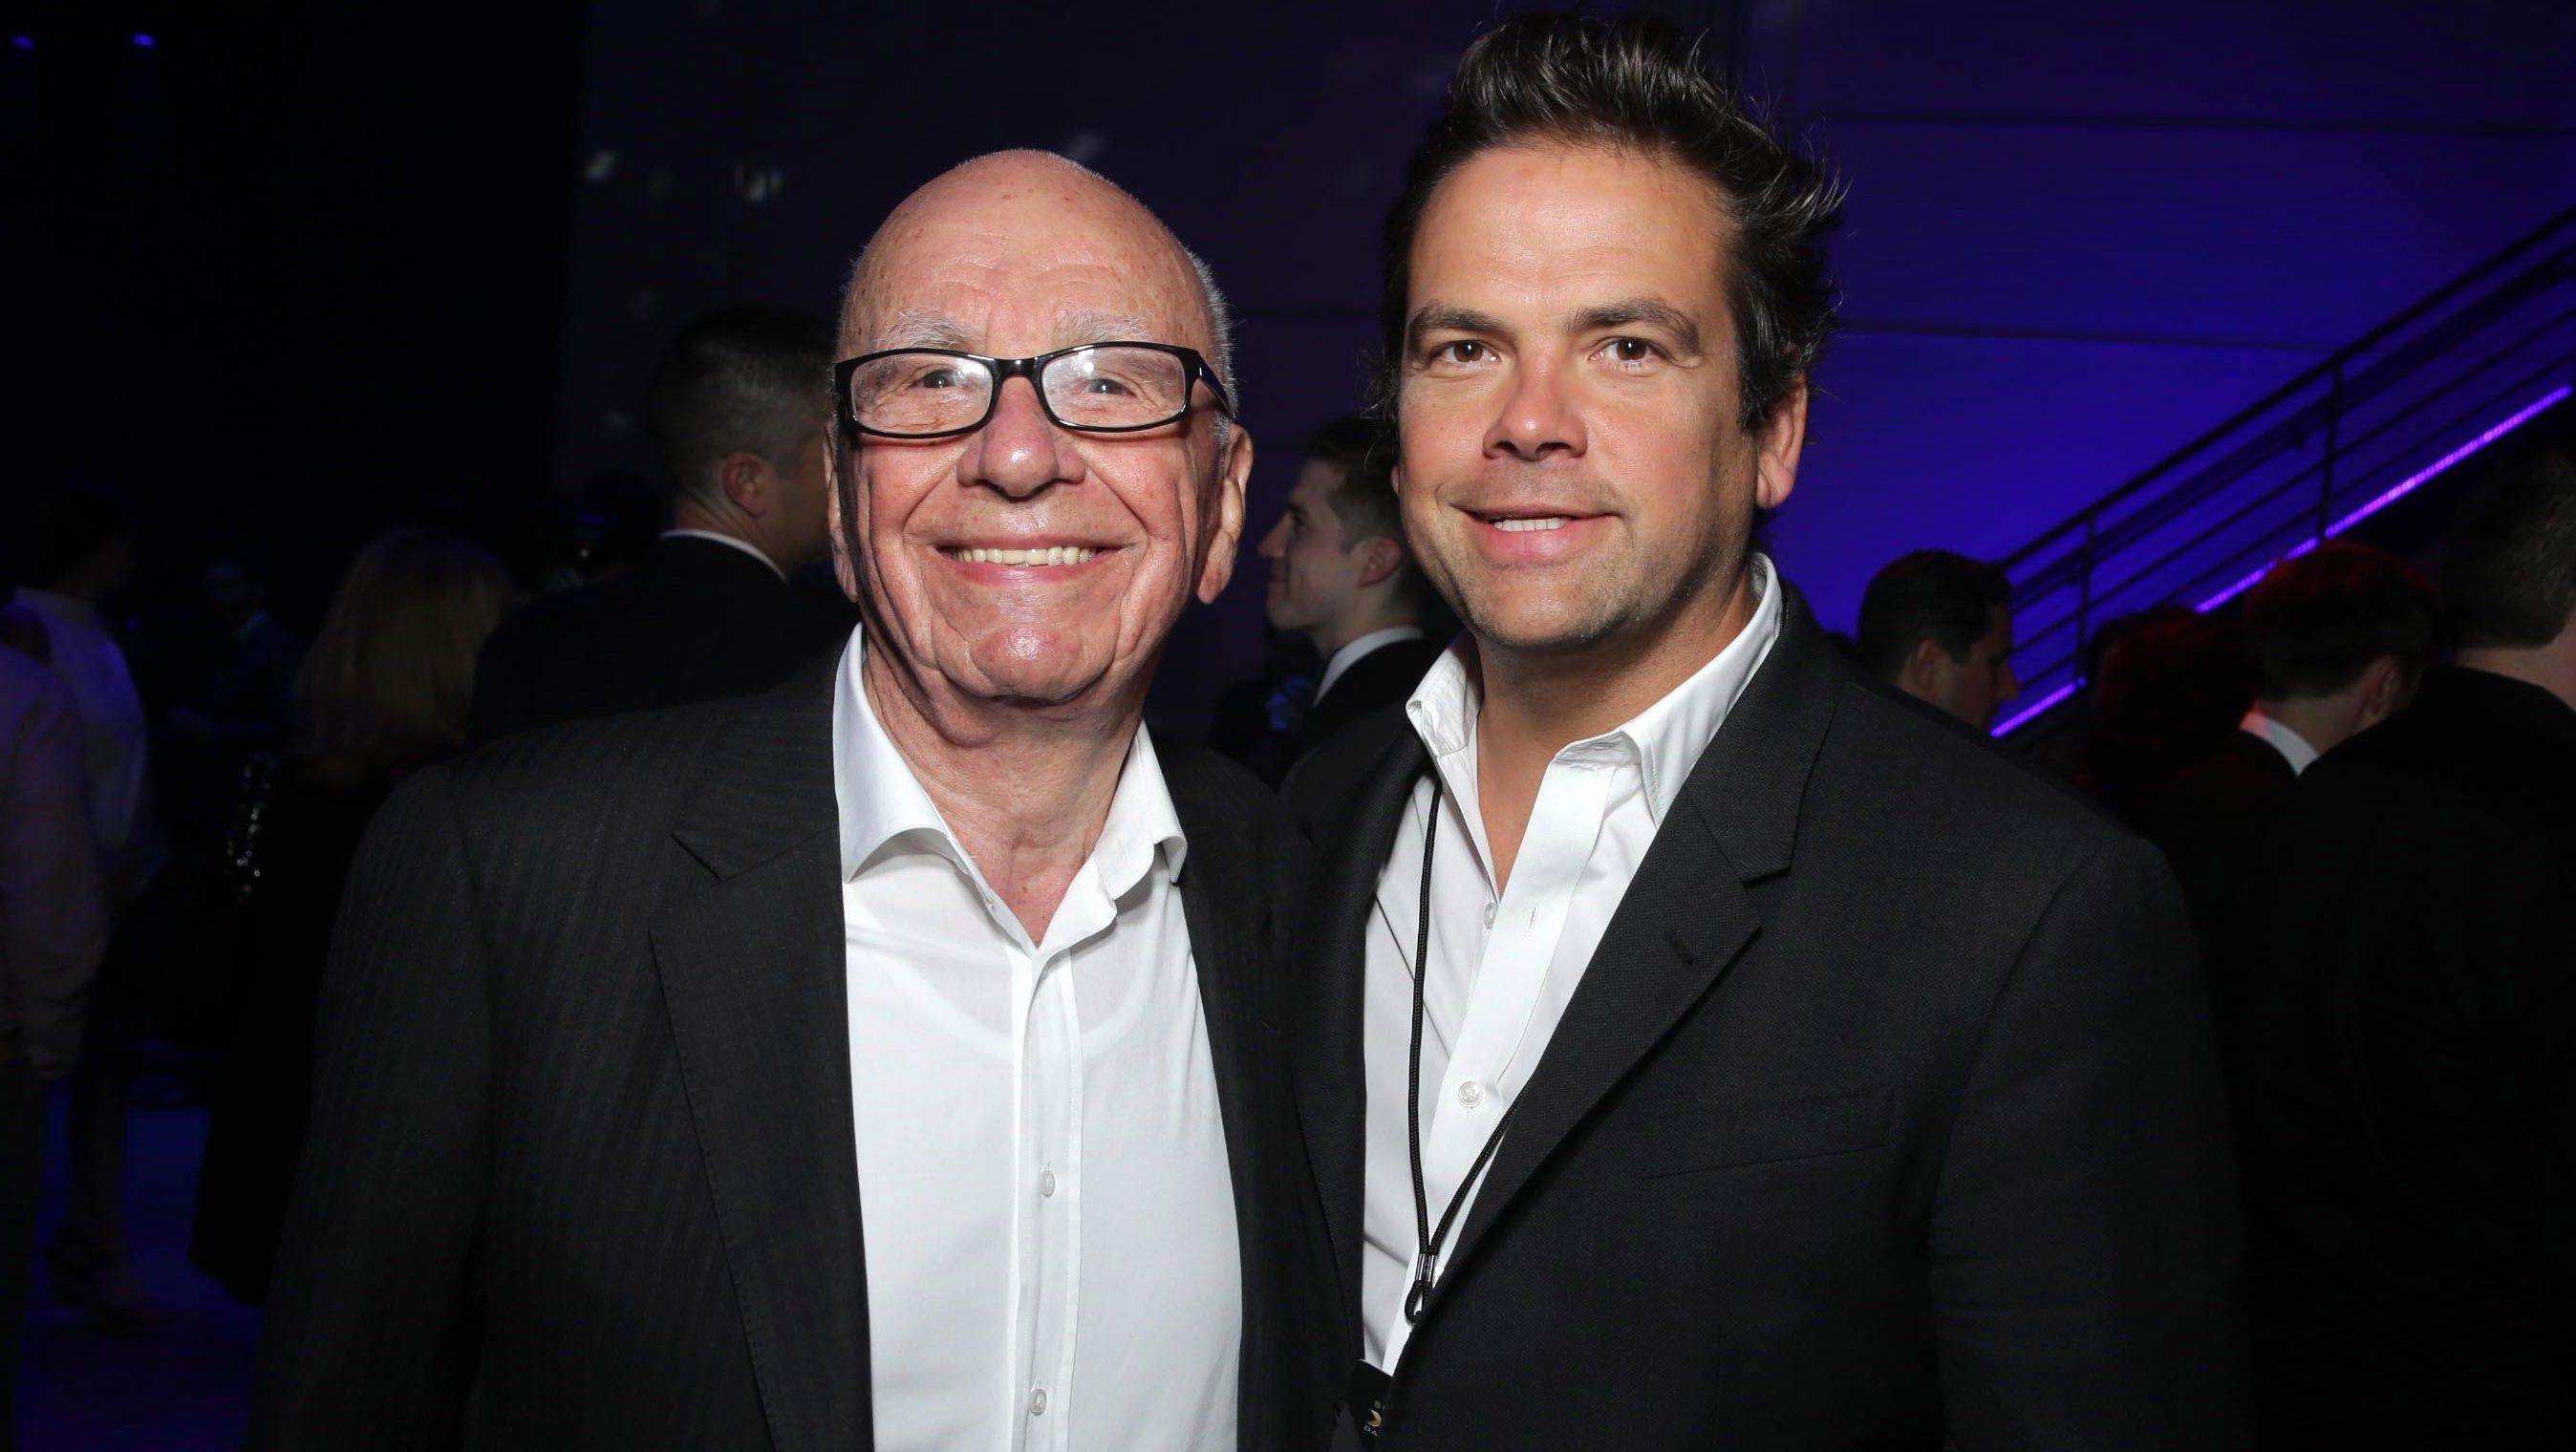 Rupert Murdoch snd Lachlan Murdoch